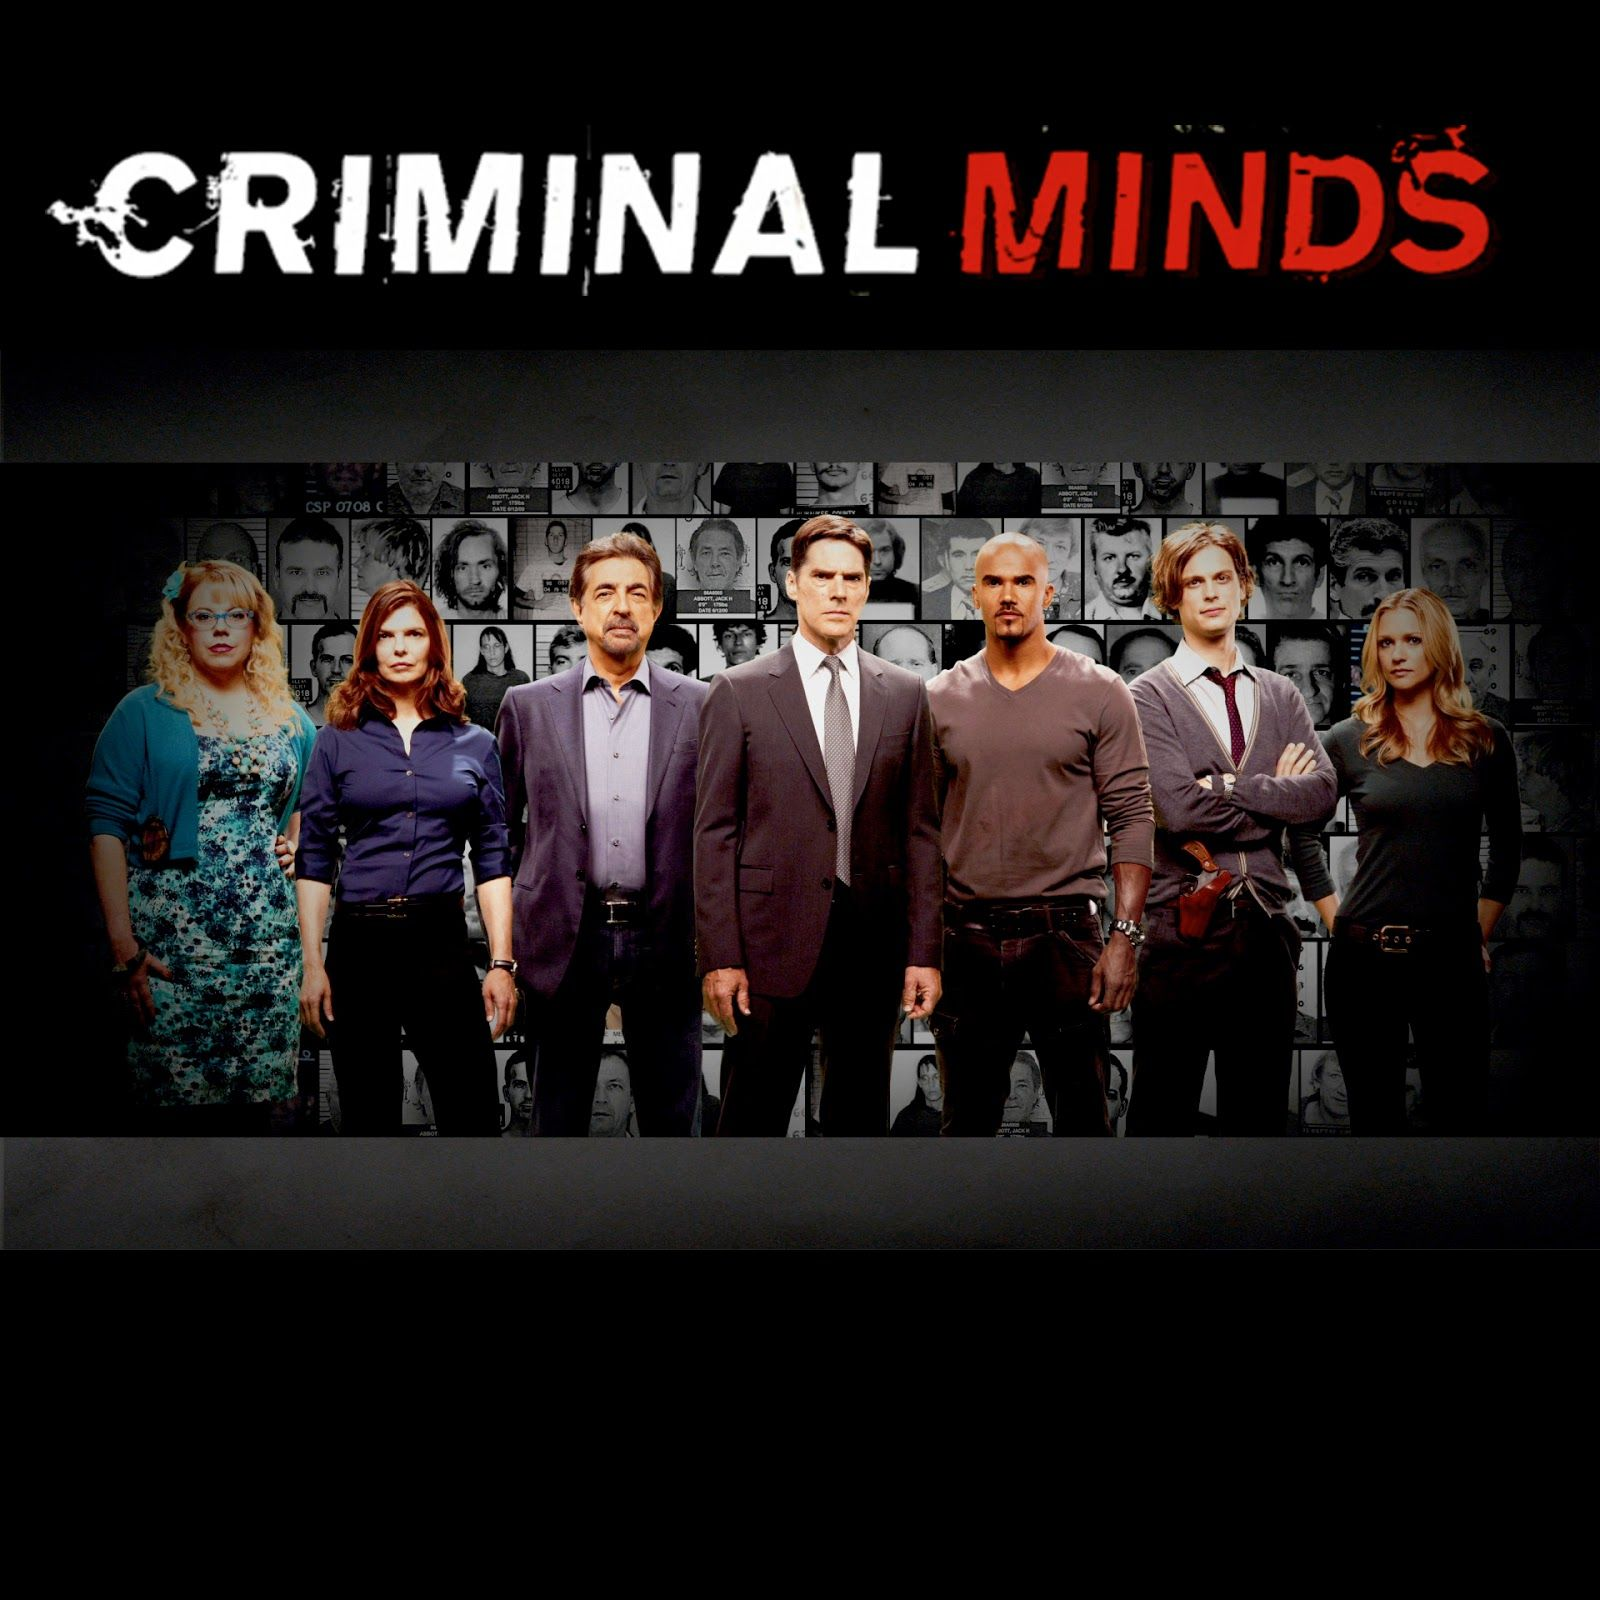 criminal minds Watch Criminal Minds Season 8 Episode 13